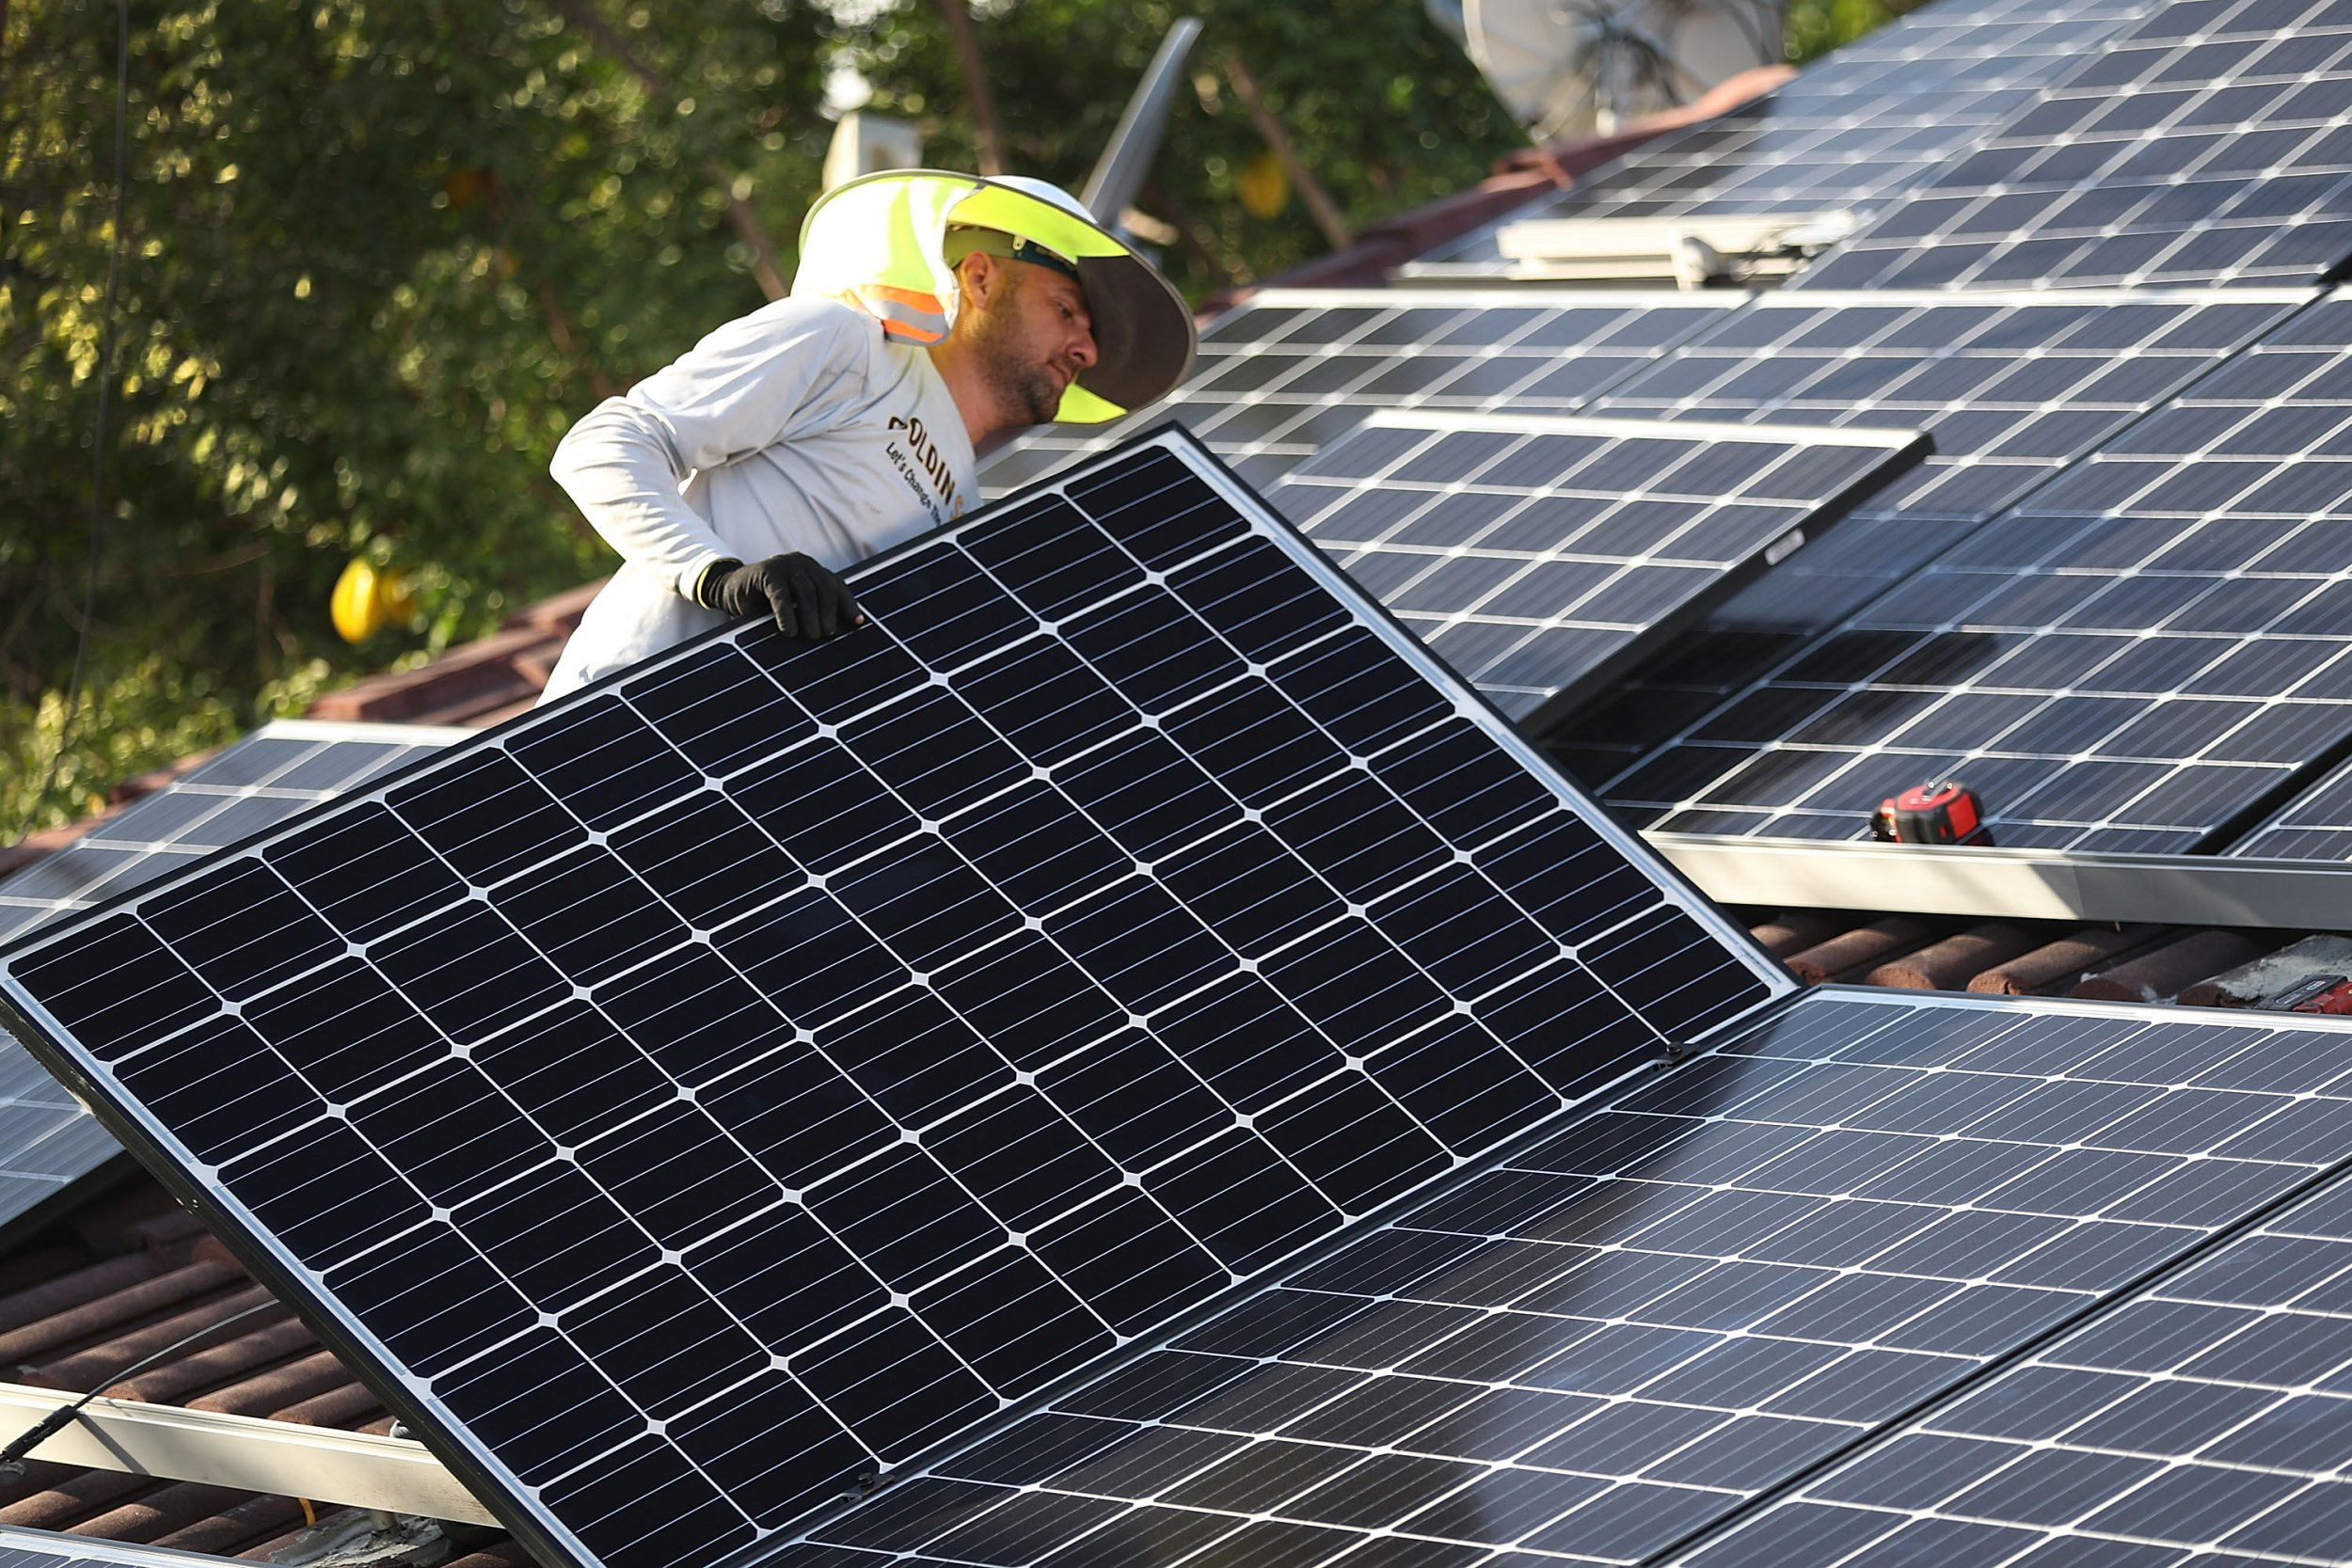 01_30_18_solarpanels